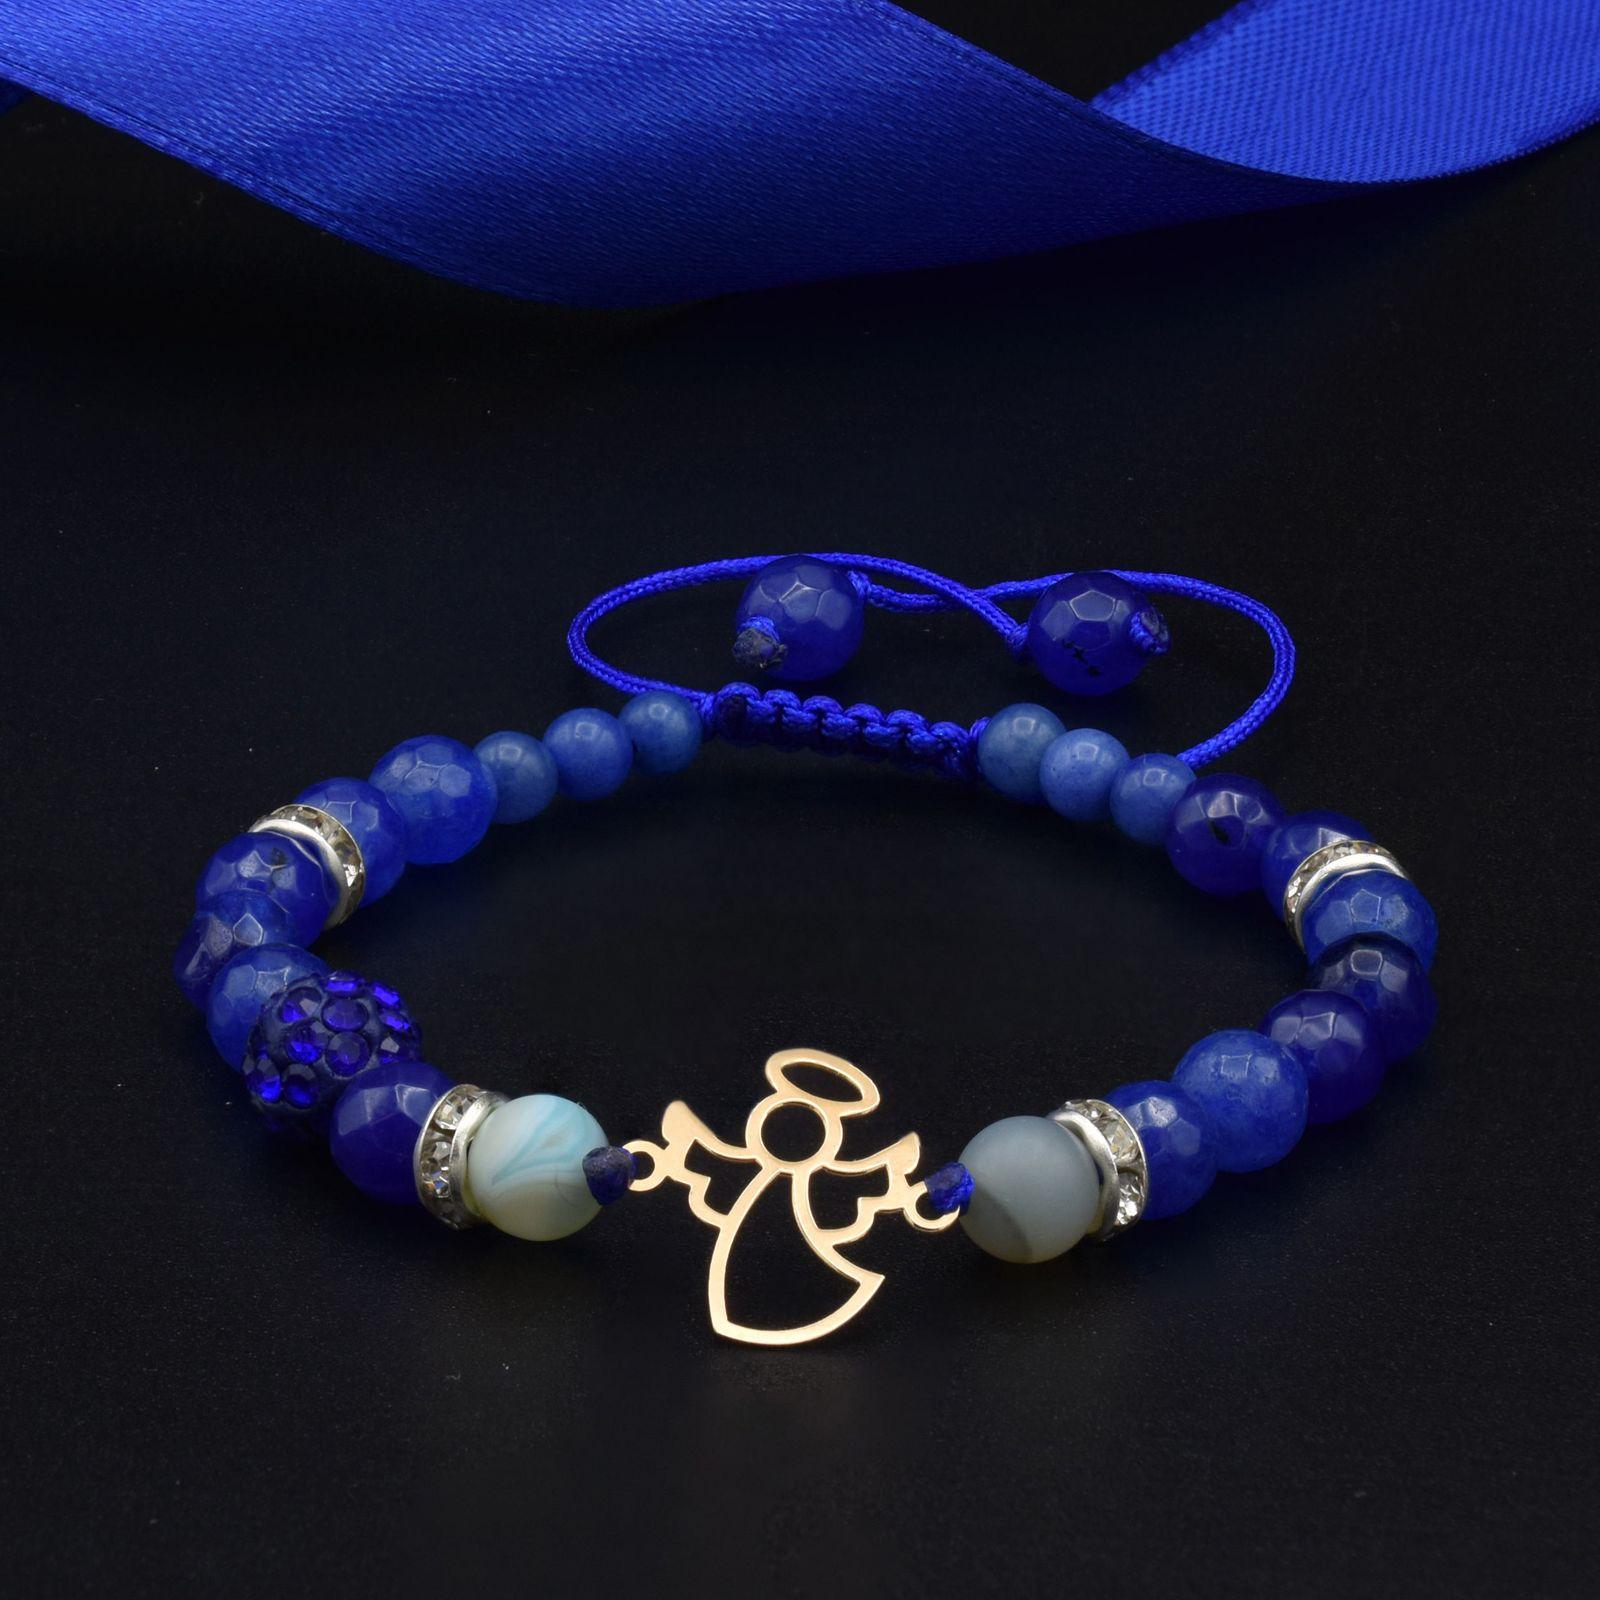 دستبند طلا 18 عیار زنانه آمانژ طرح فرشته کد 945D8898 -  - 1